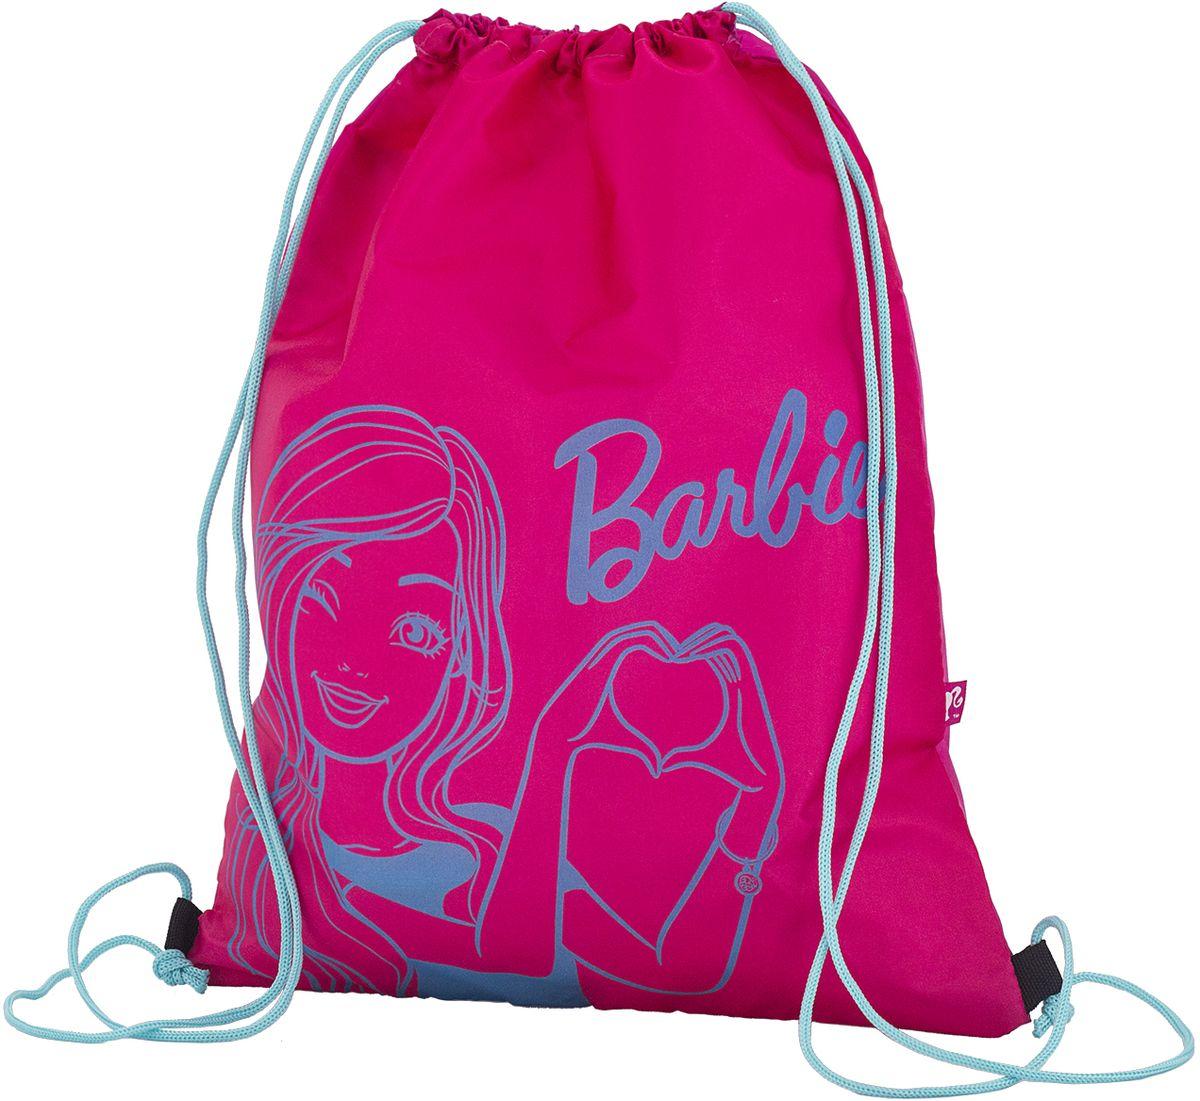 Barbie Сумка для сменной обуви BREB-MT2-883 transformers сумка для сменной обуви prime treb mt2 883